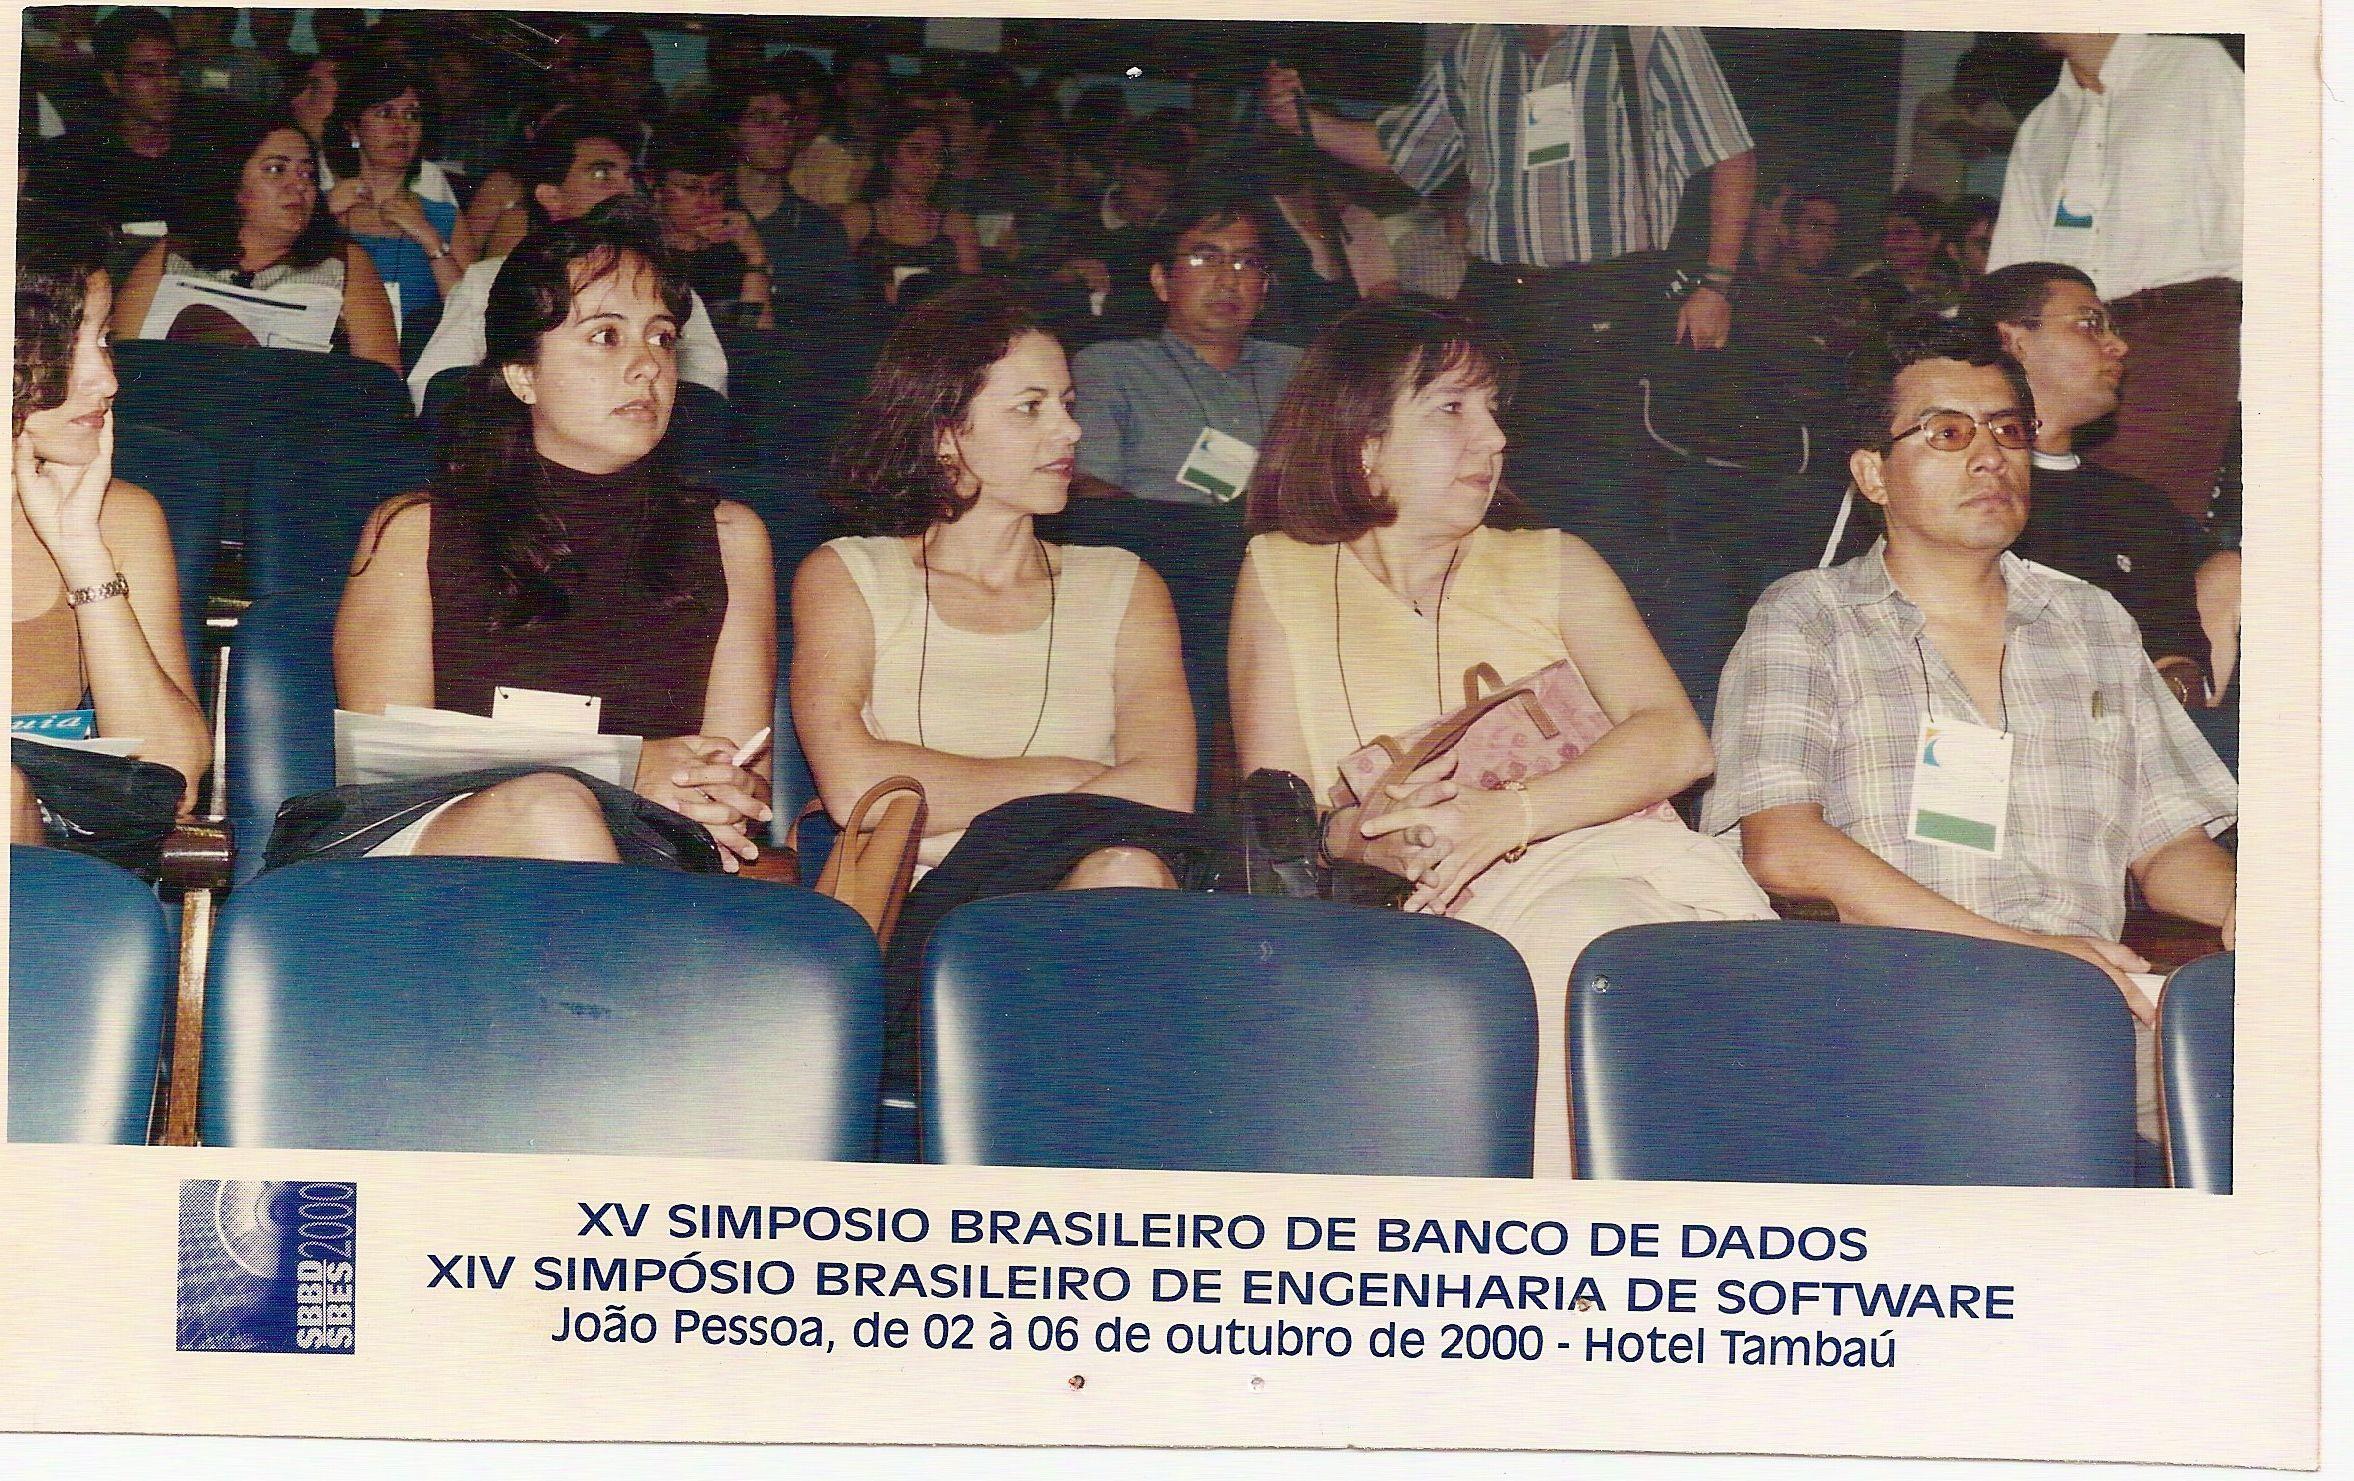 Fernanda Baião, Marta Mattoso, Maria Luiza